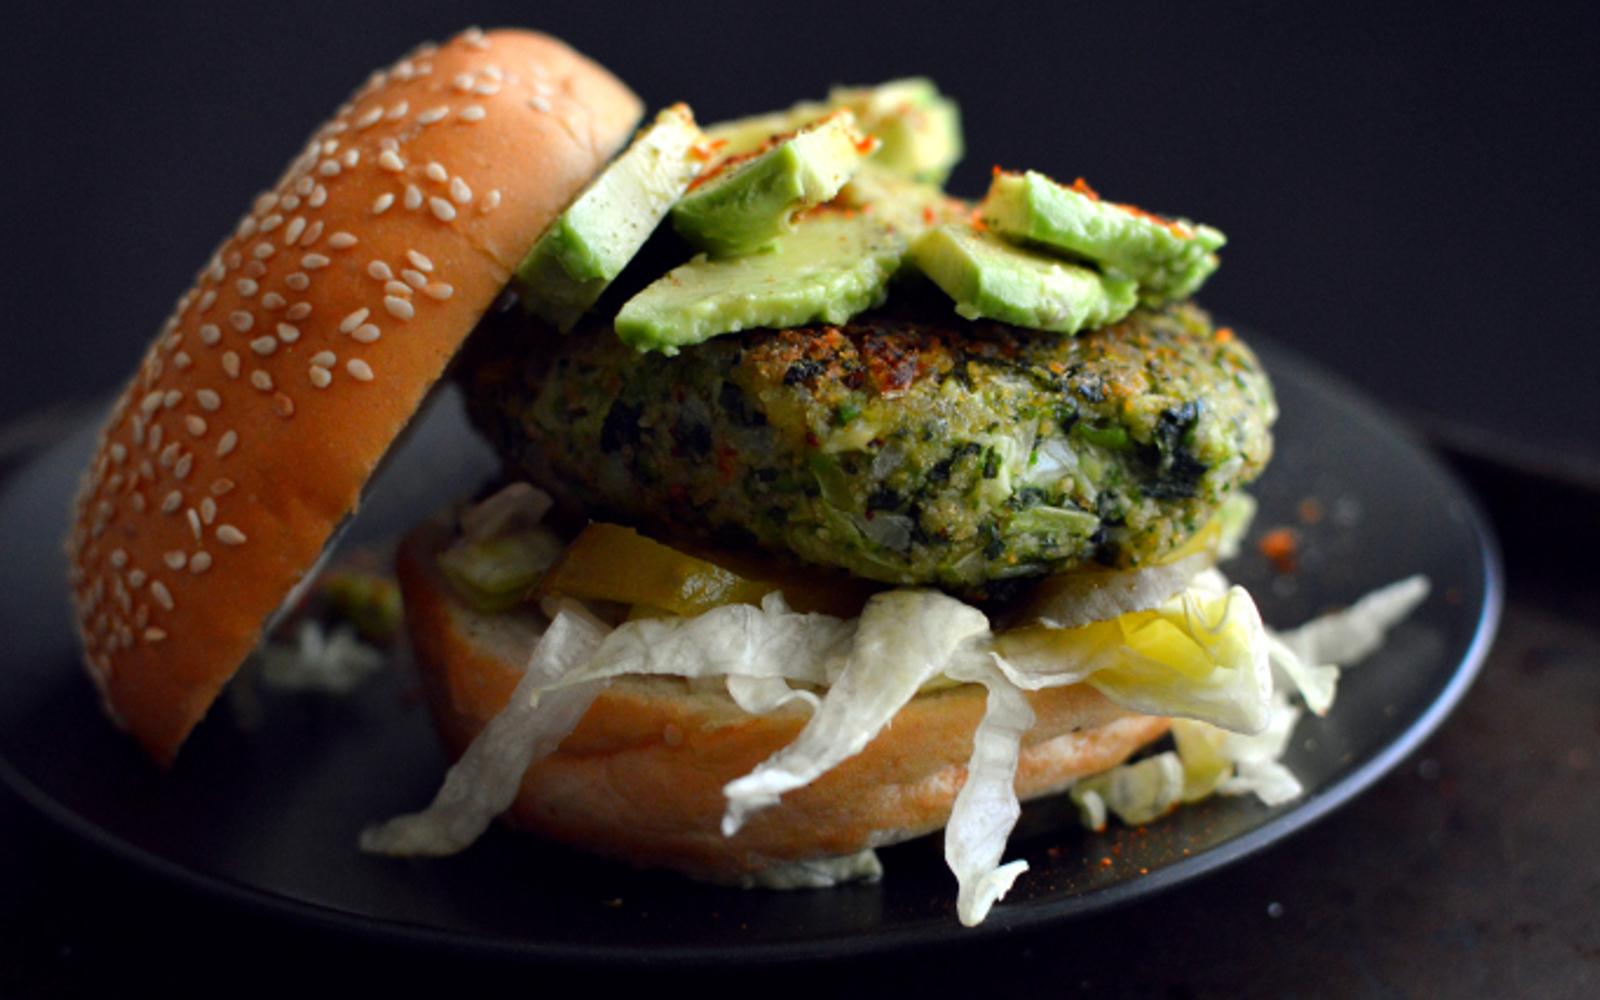 Green Vegetable Burger